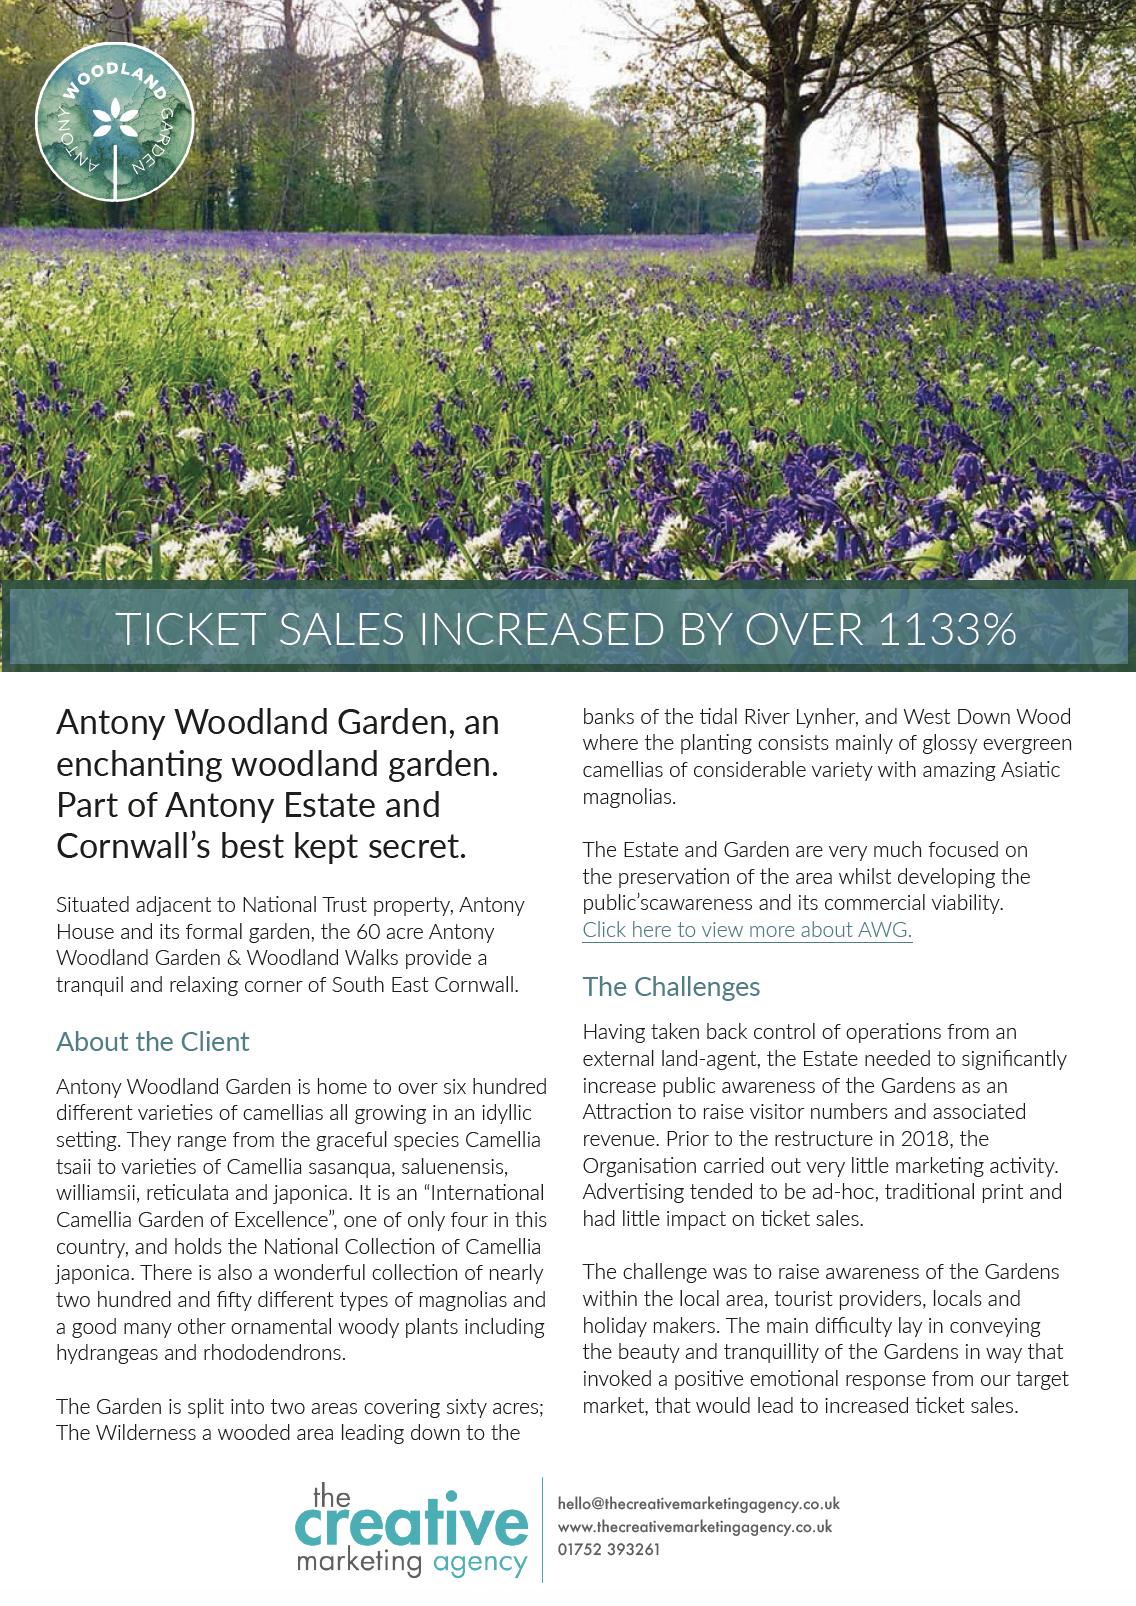 Antony Woodland Garden case study